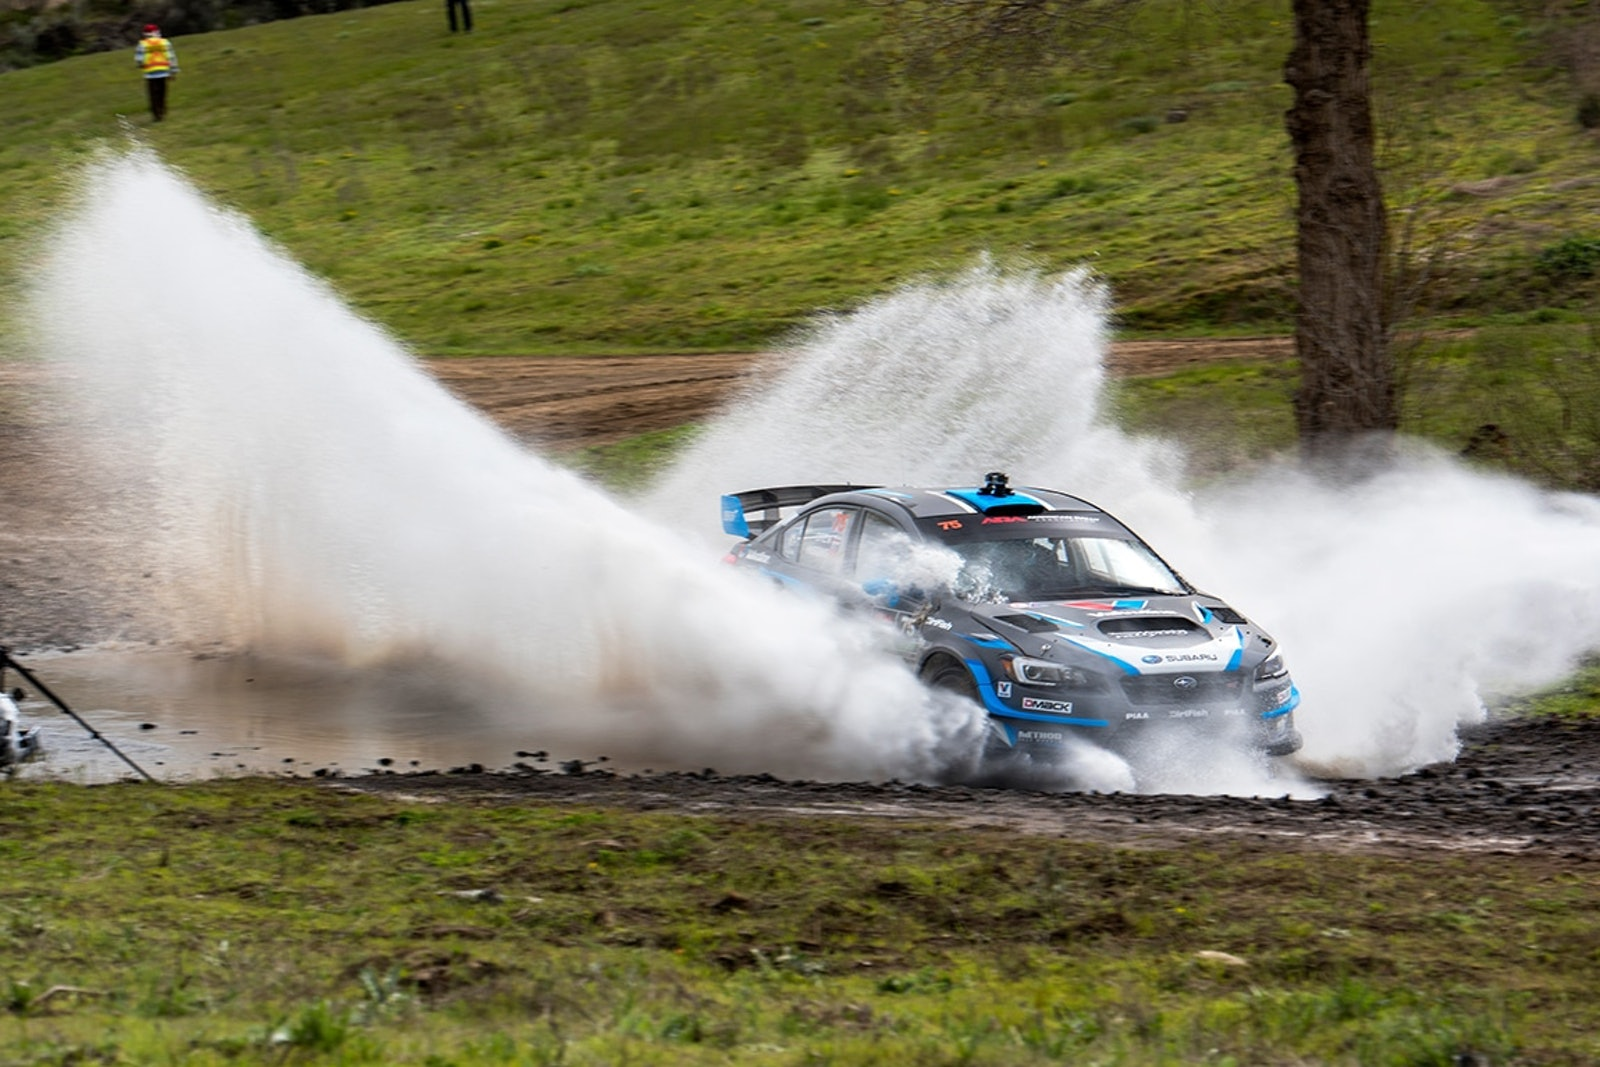 David_Higgins_blasts_through_a_water_splash_at_the_Oregon_Trail_Rally